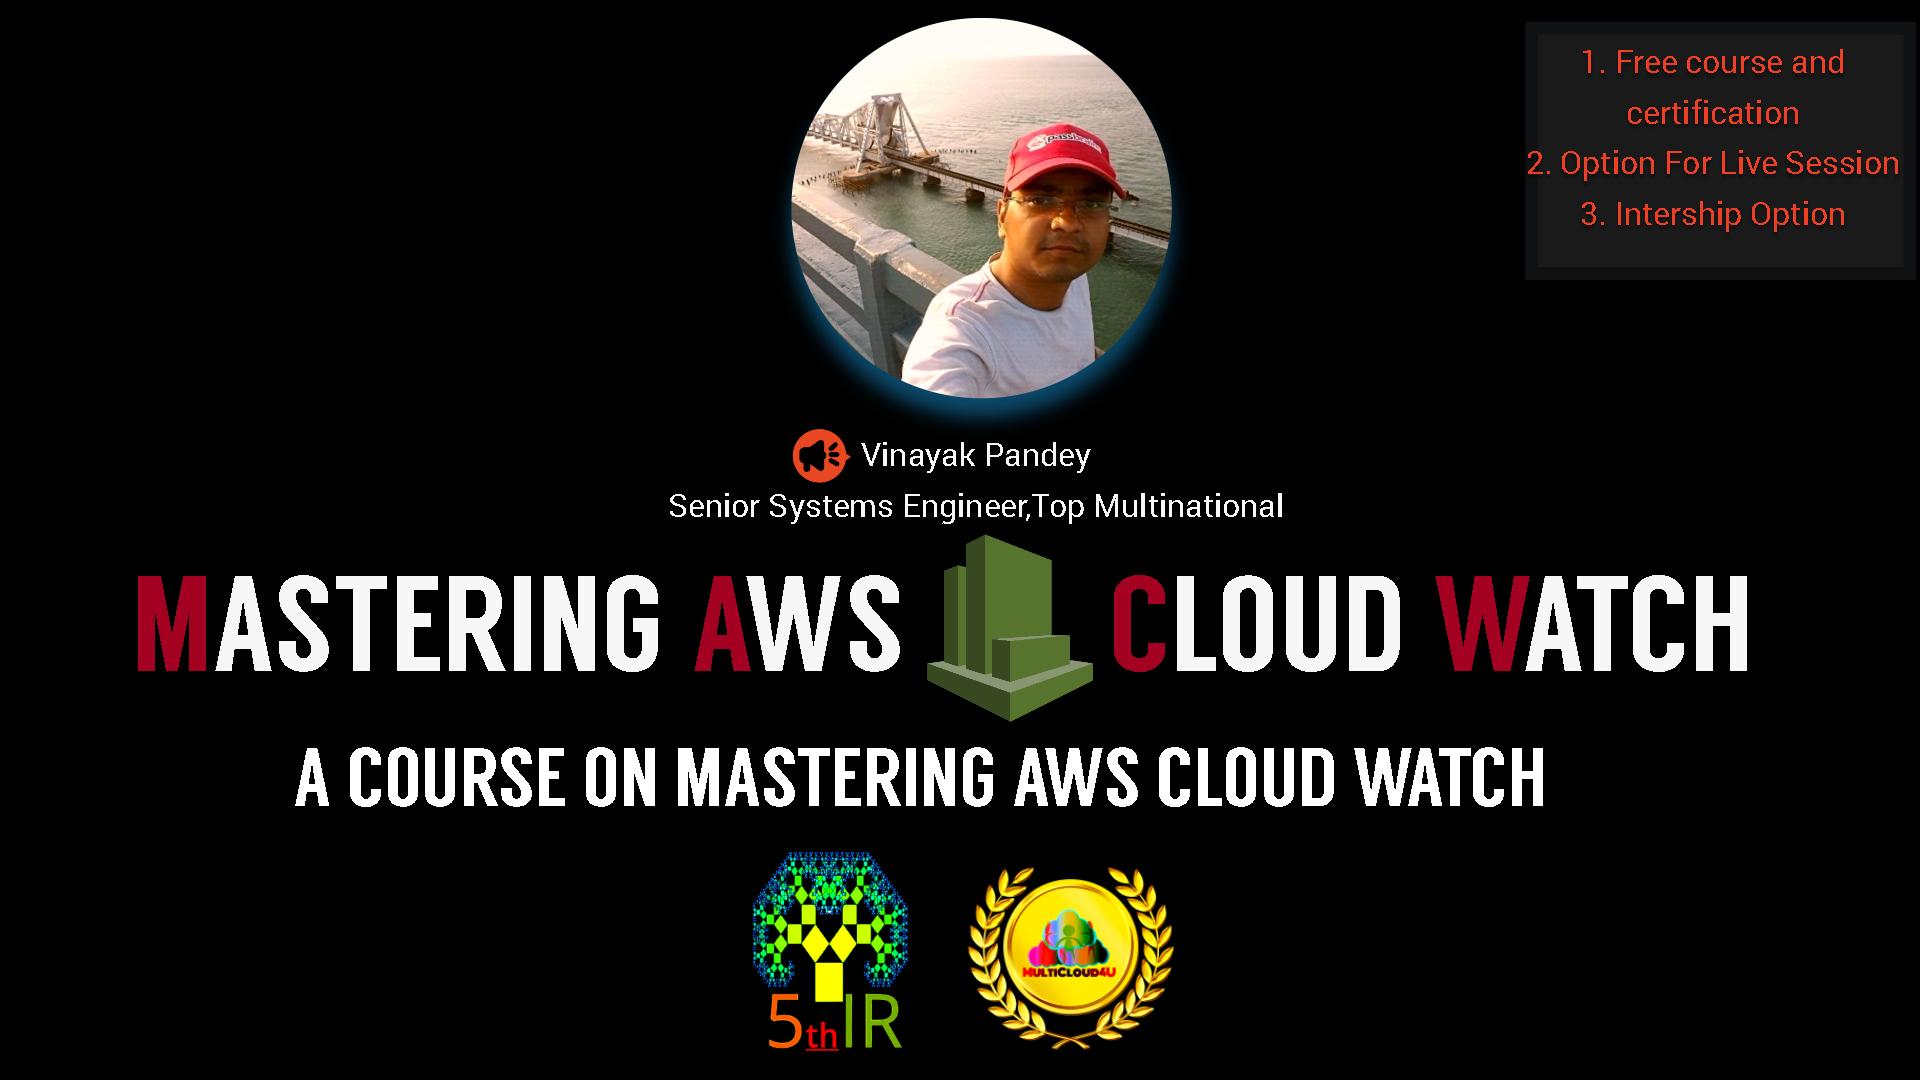 Mastering AWS Cloud Watch